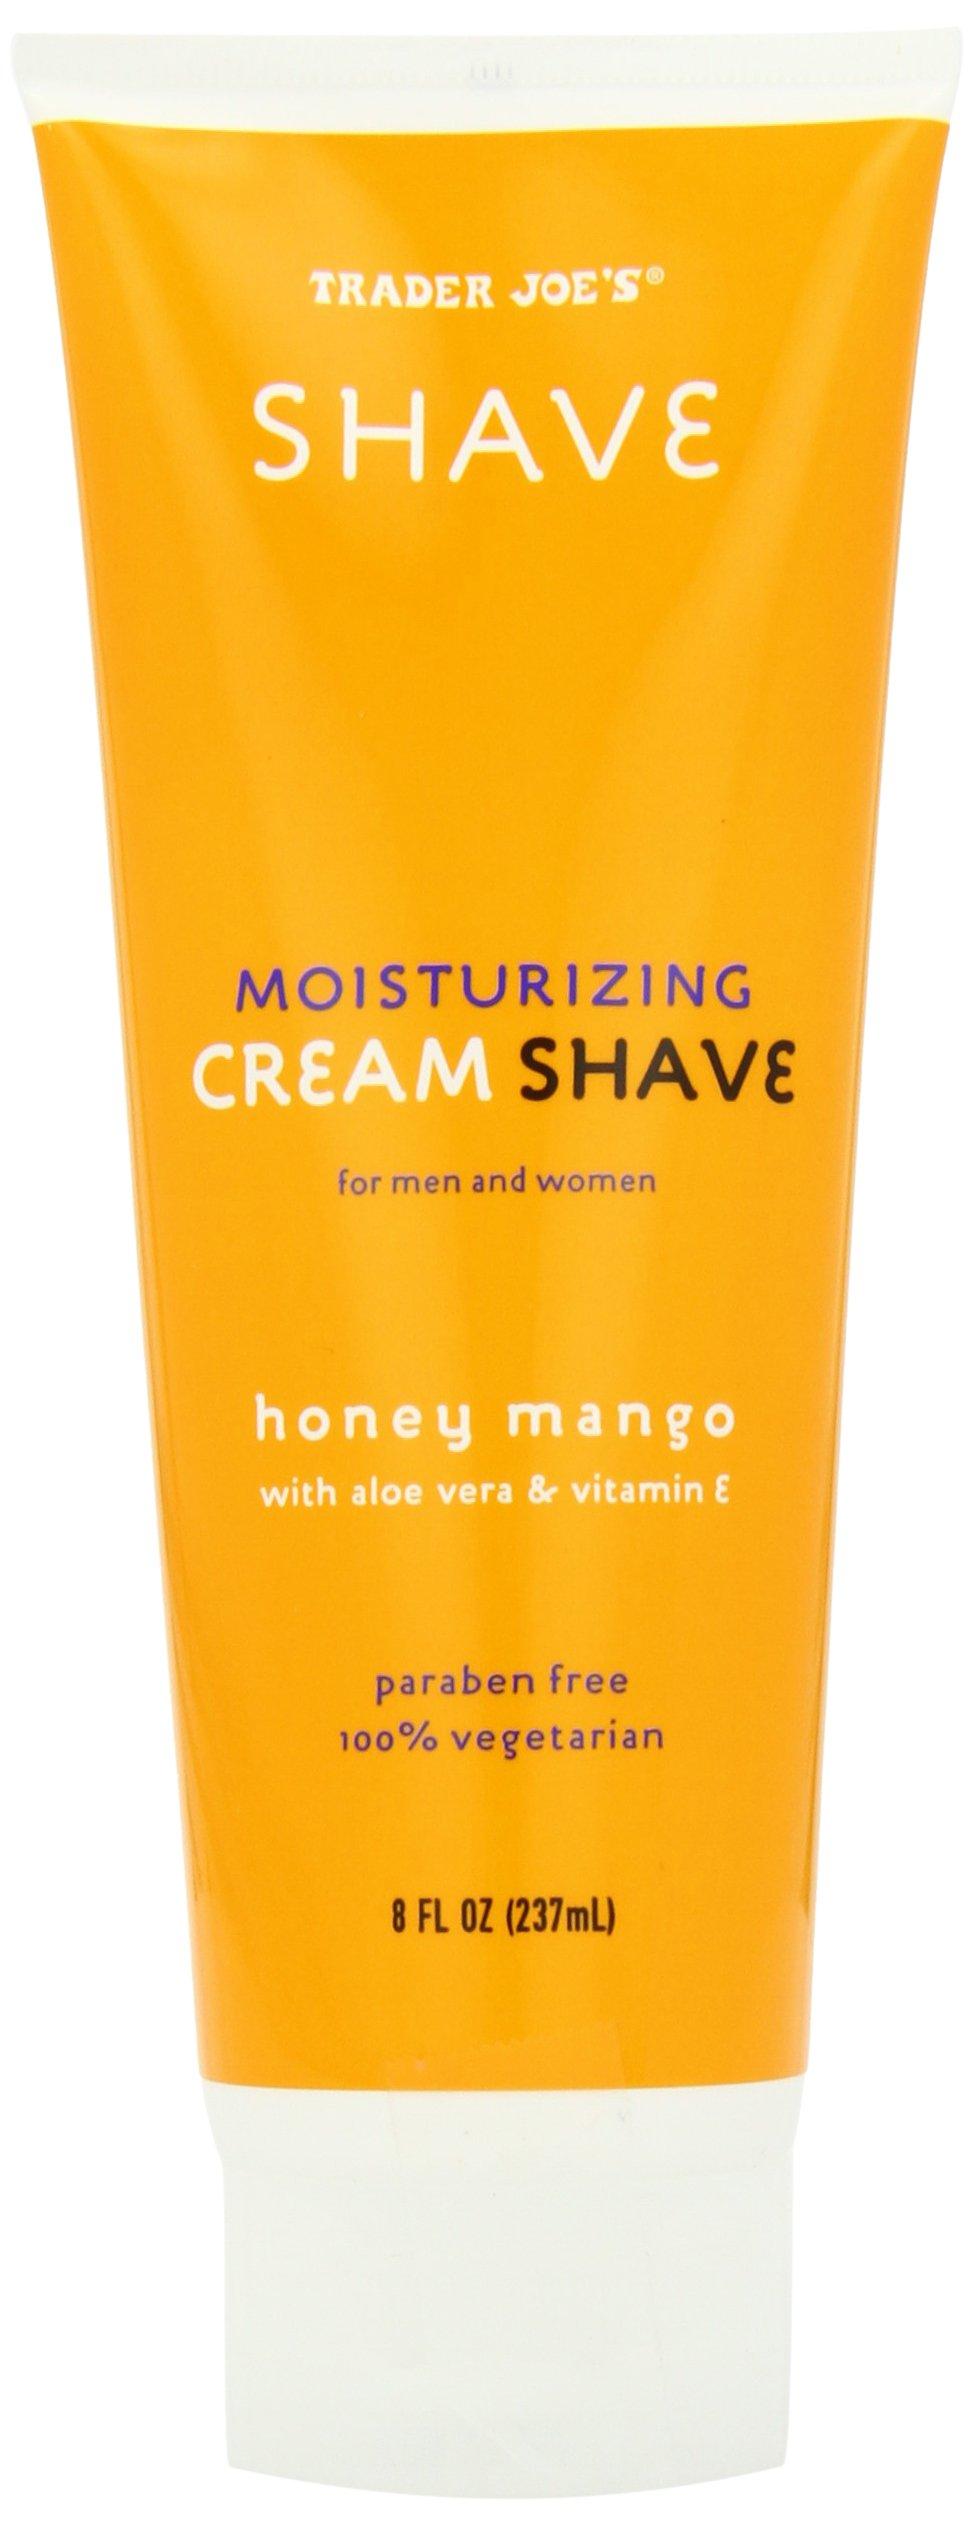 Trader Joe's Moisturizing Cream Shave Honey Mango, 8 fl. oz.